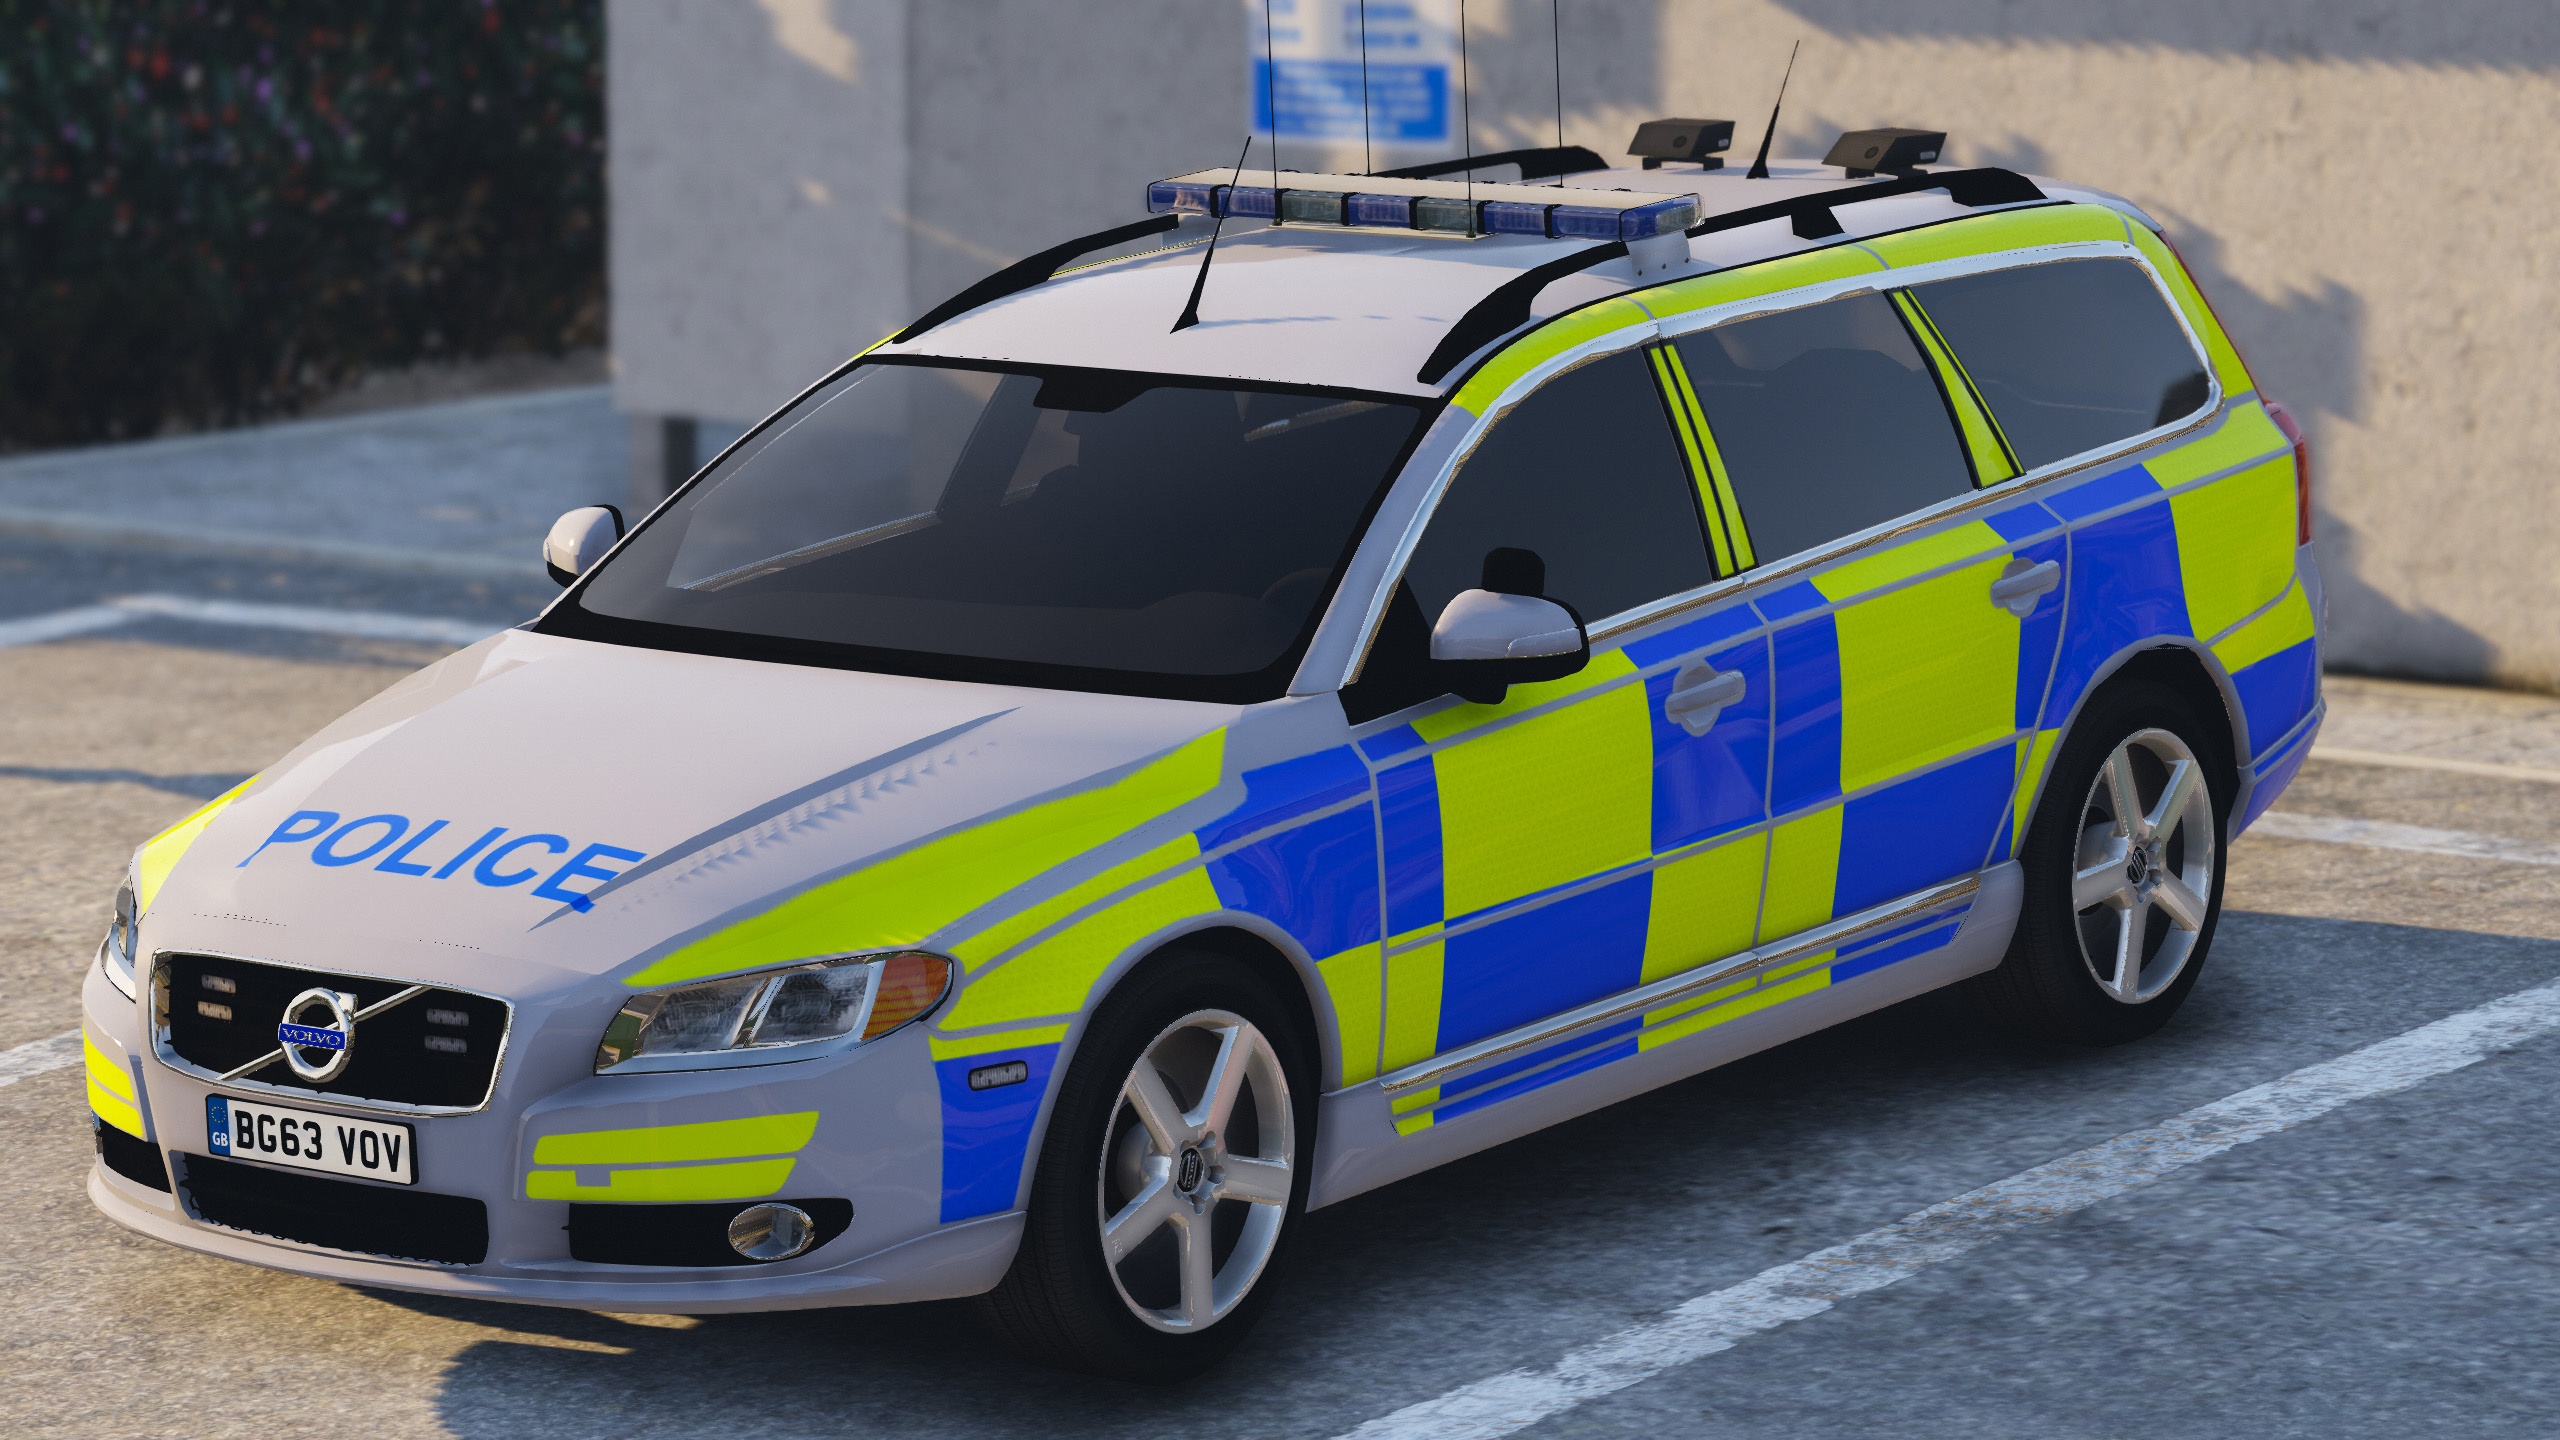 Police Volvo V70 Gta5 Mods Com